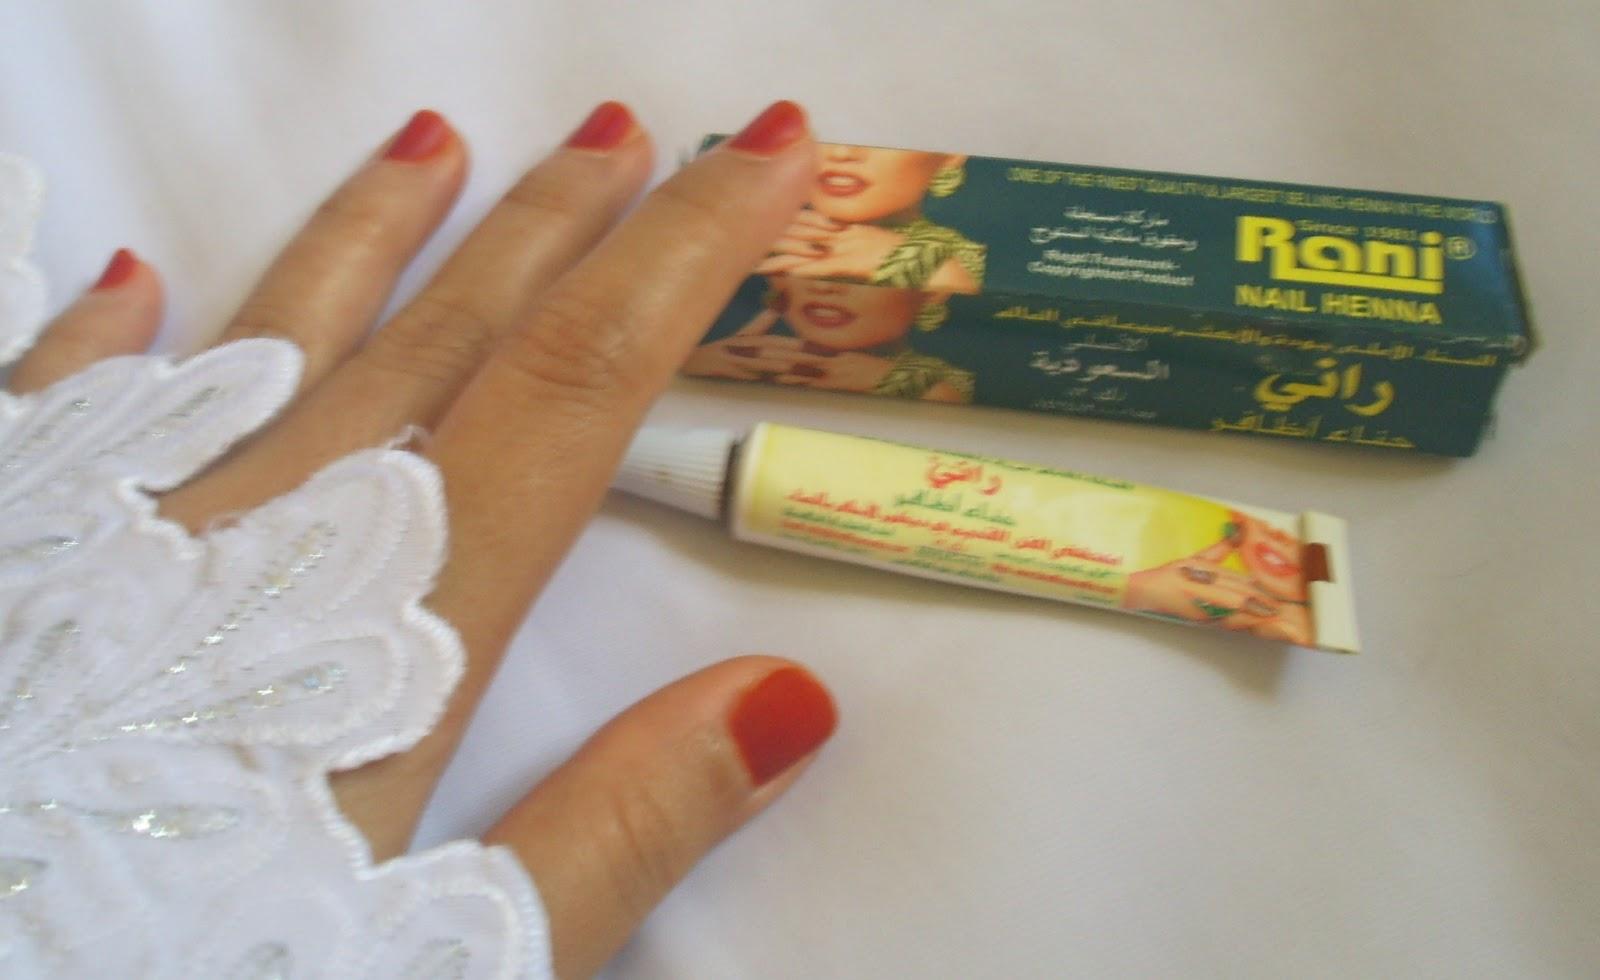 Nael39s Note RANI Nail Henna Pacar Kuku